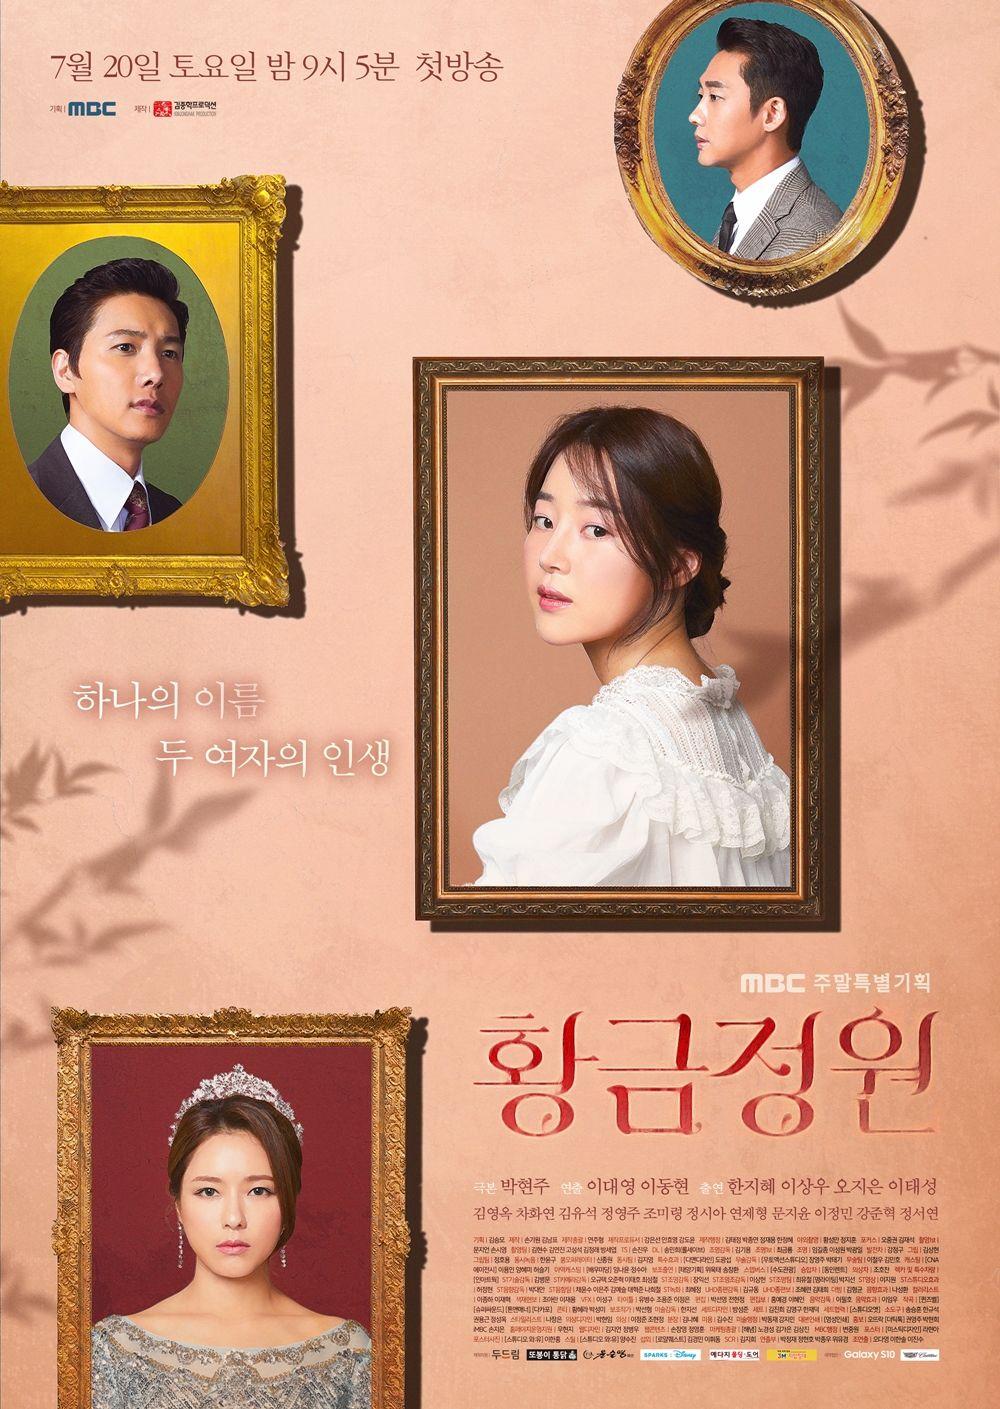 Golden garden korean drama 2019 korean drama drama